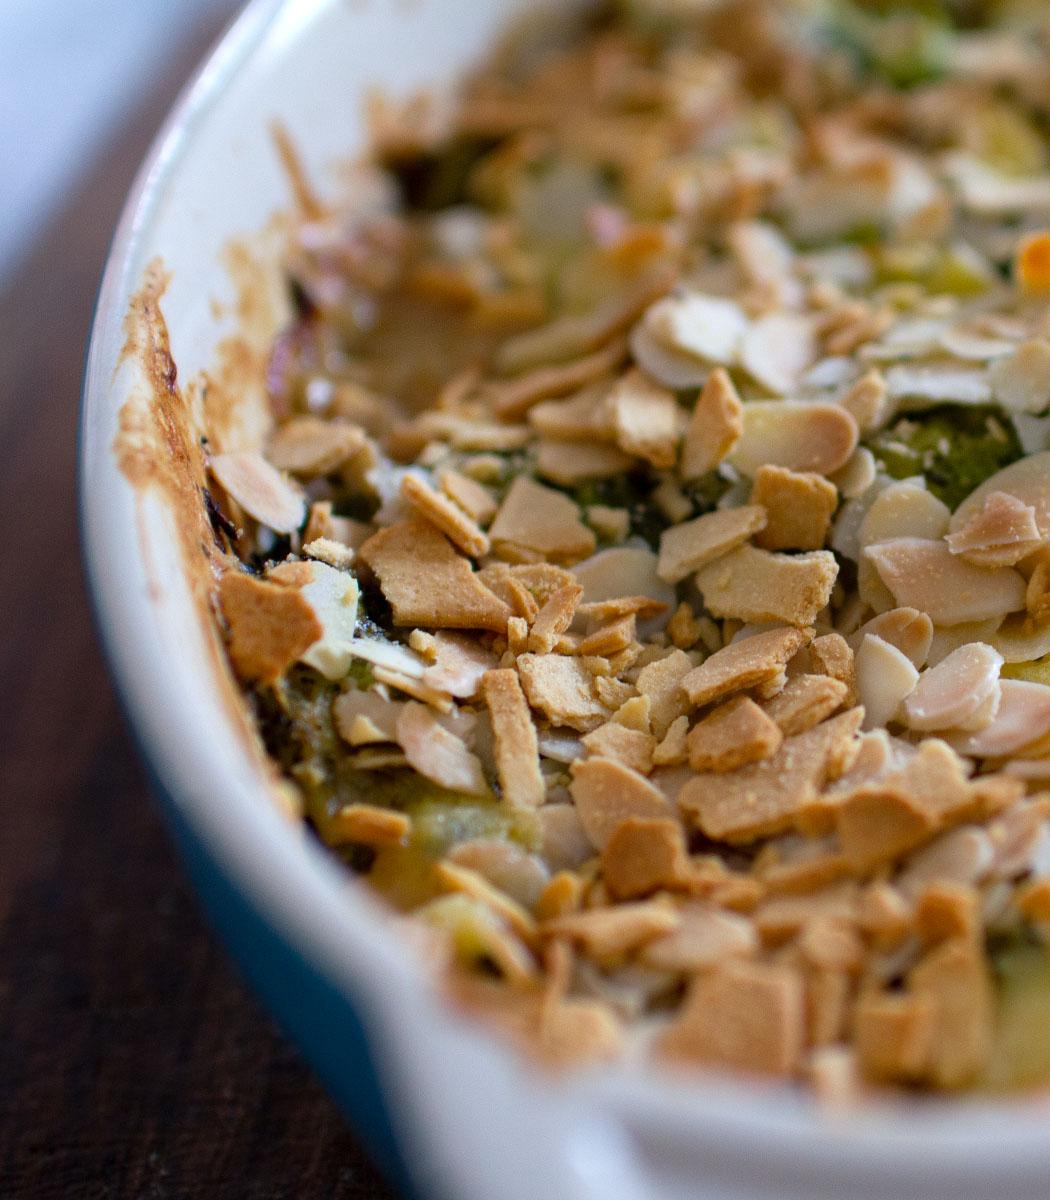 Cheesy Sharpham Rustic Garlic & Chive Broccoli Bake